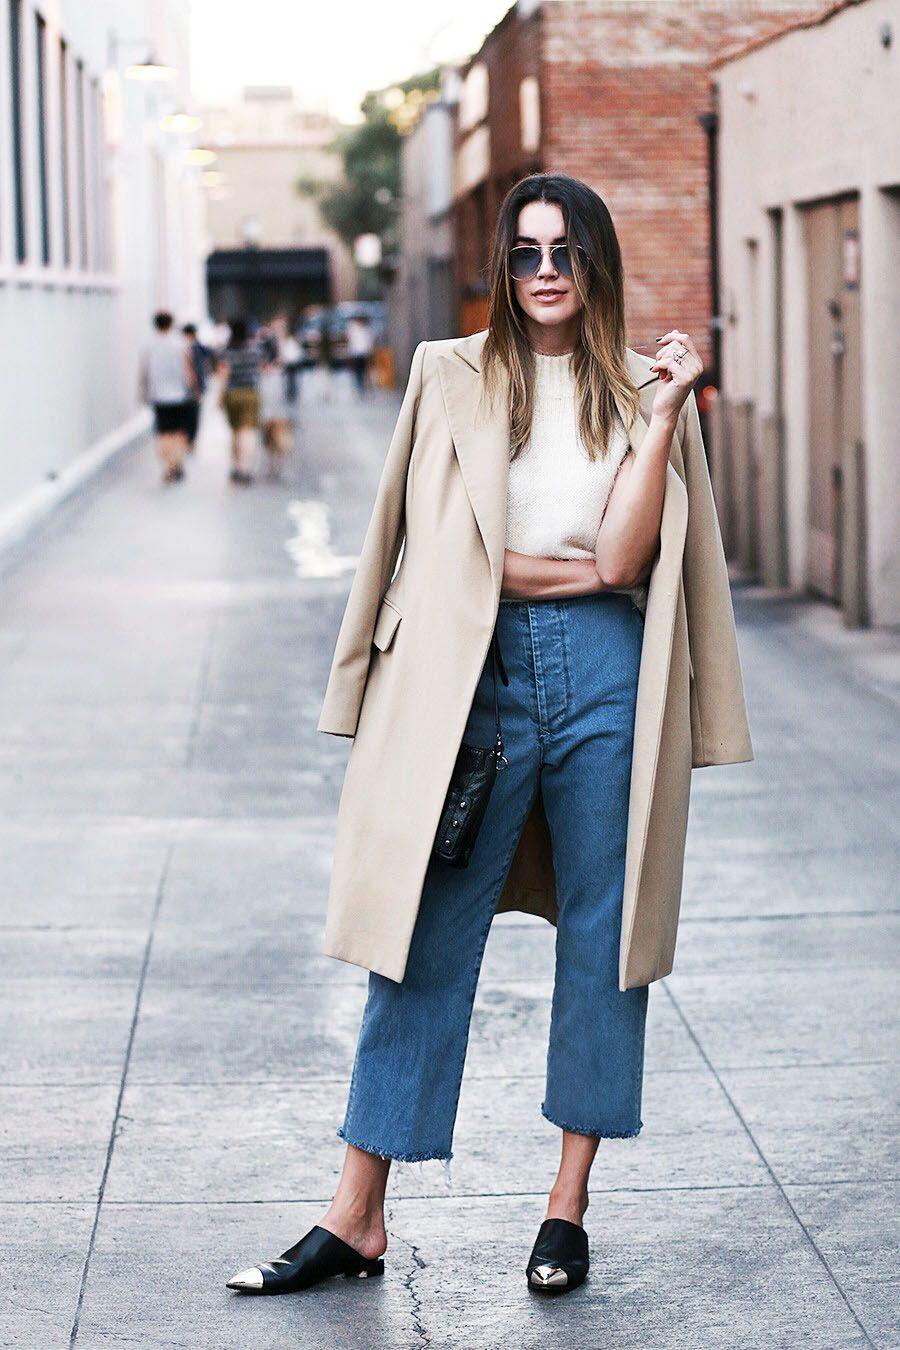 thời trang phụ nữ tuổi 30 7